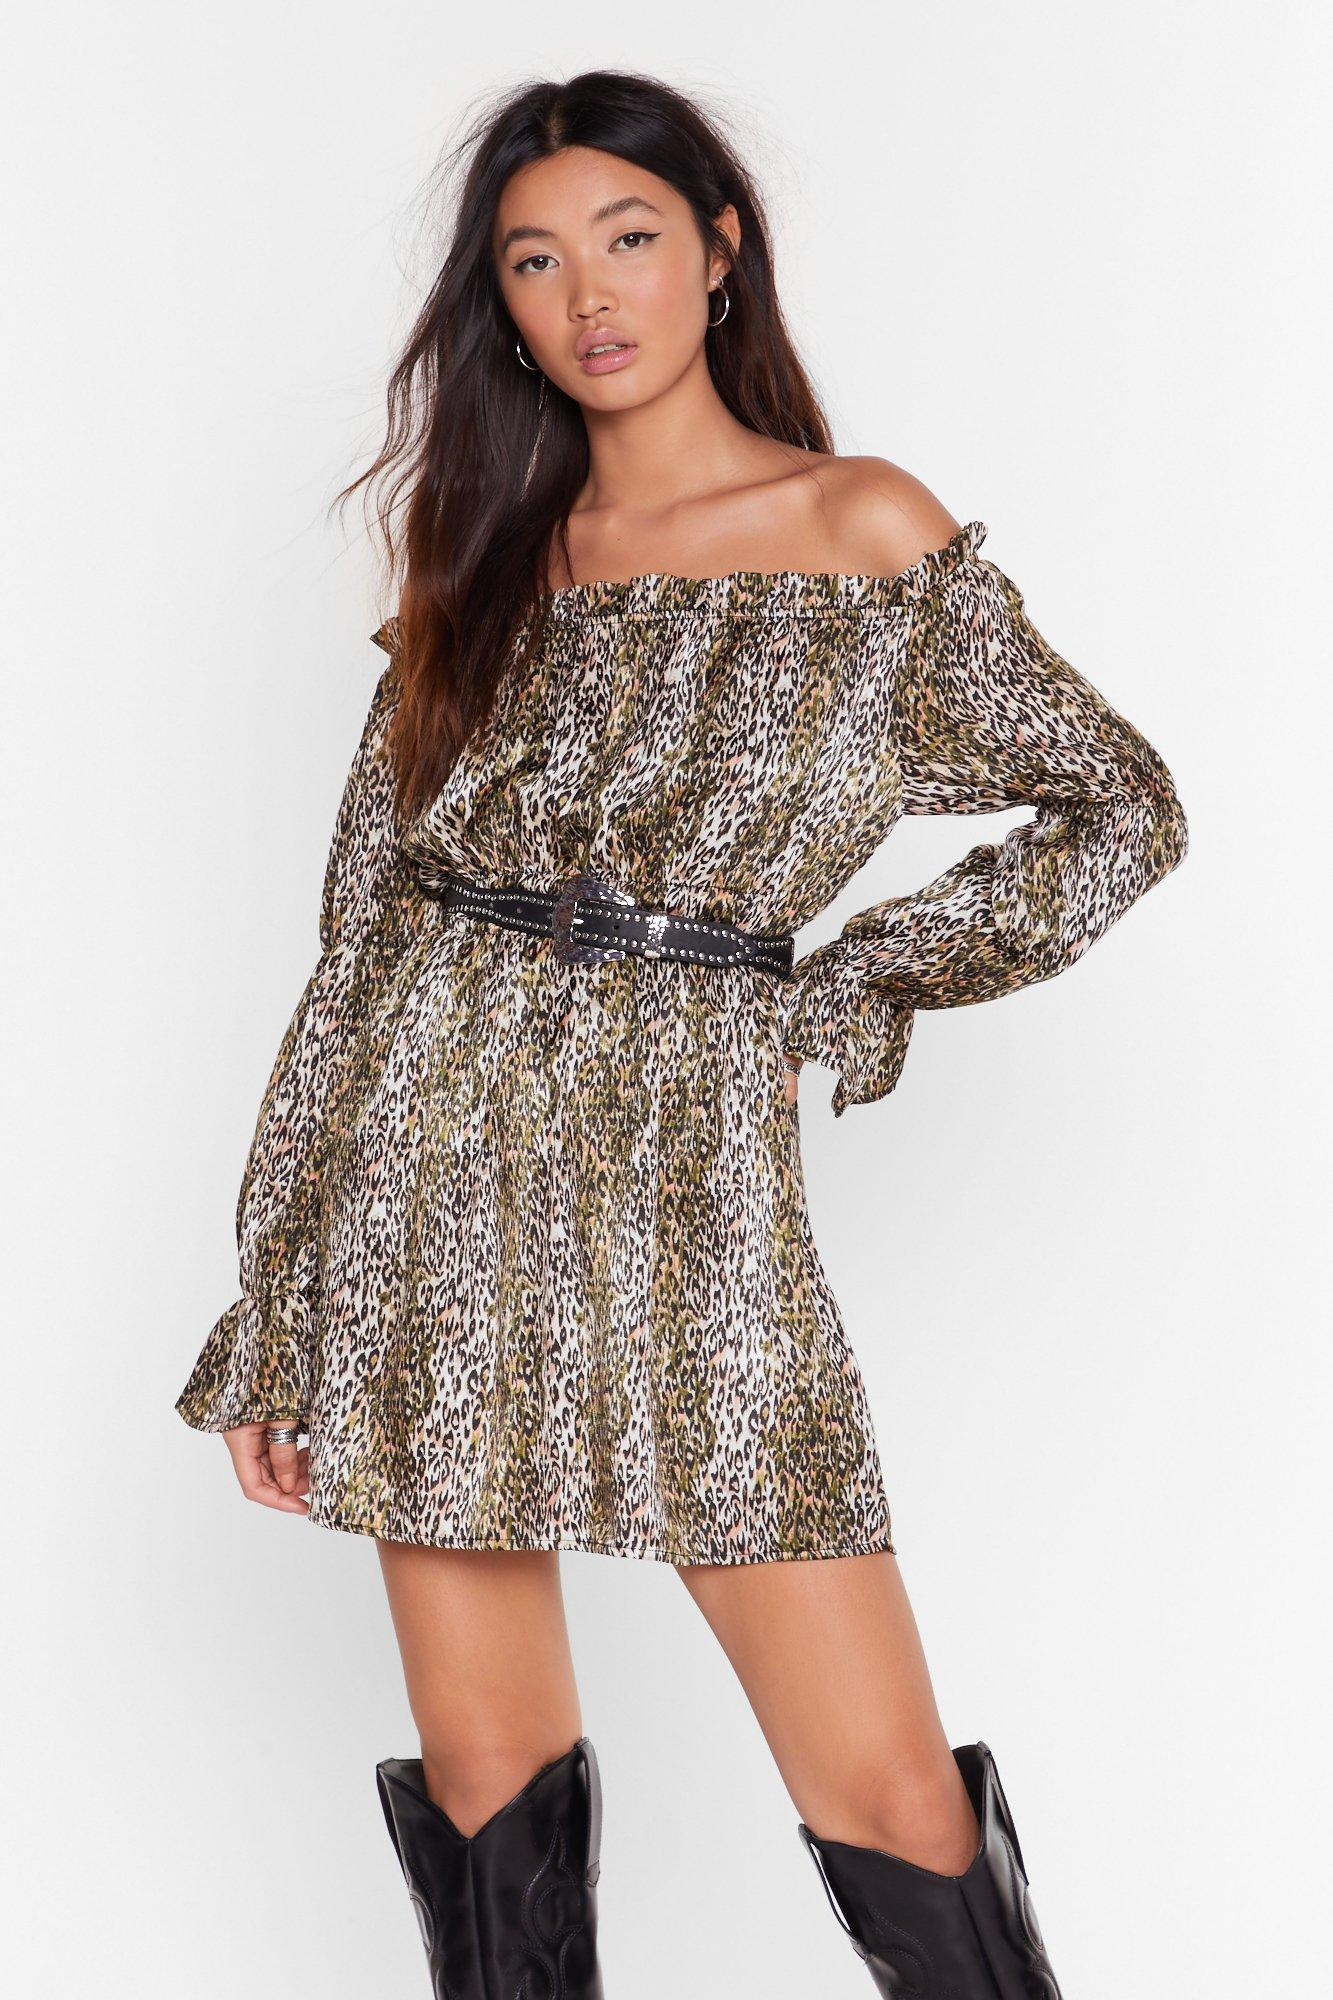 Image of Wild Awake Leopard Mini Dress